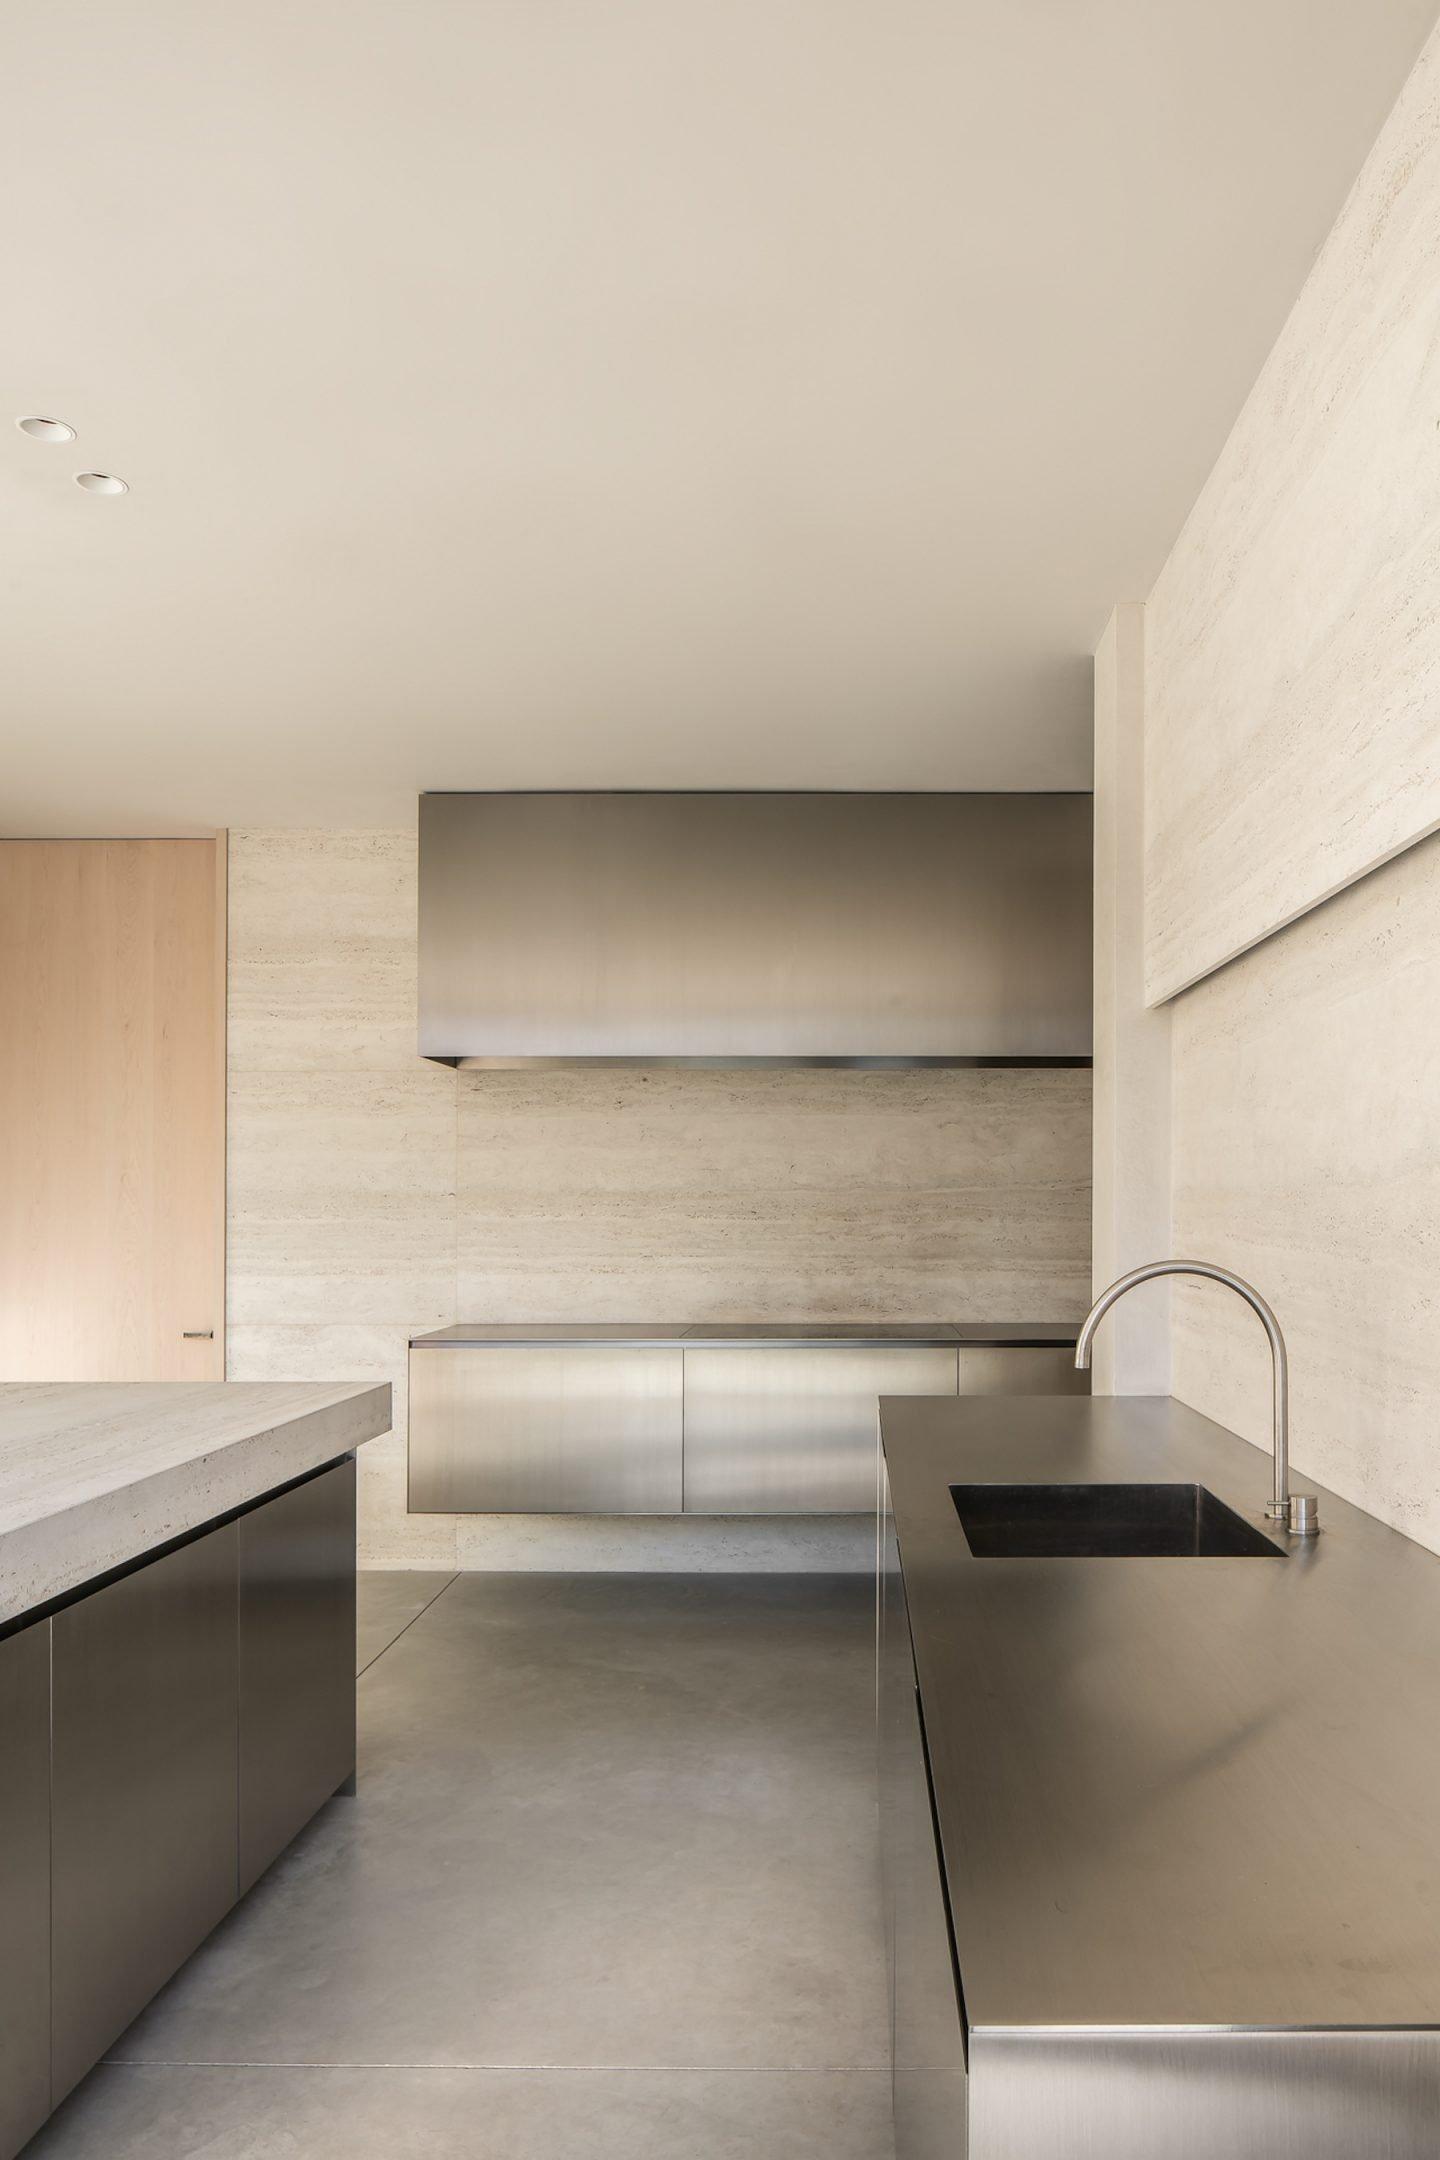 IGNANT-Design-Marie-Stadsbader-Diapal-01